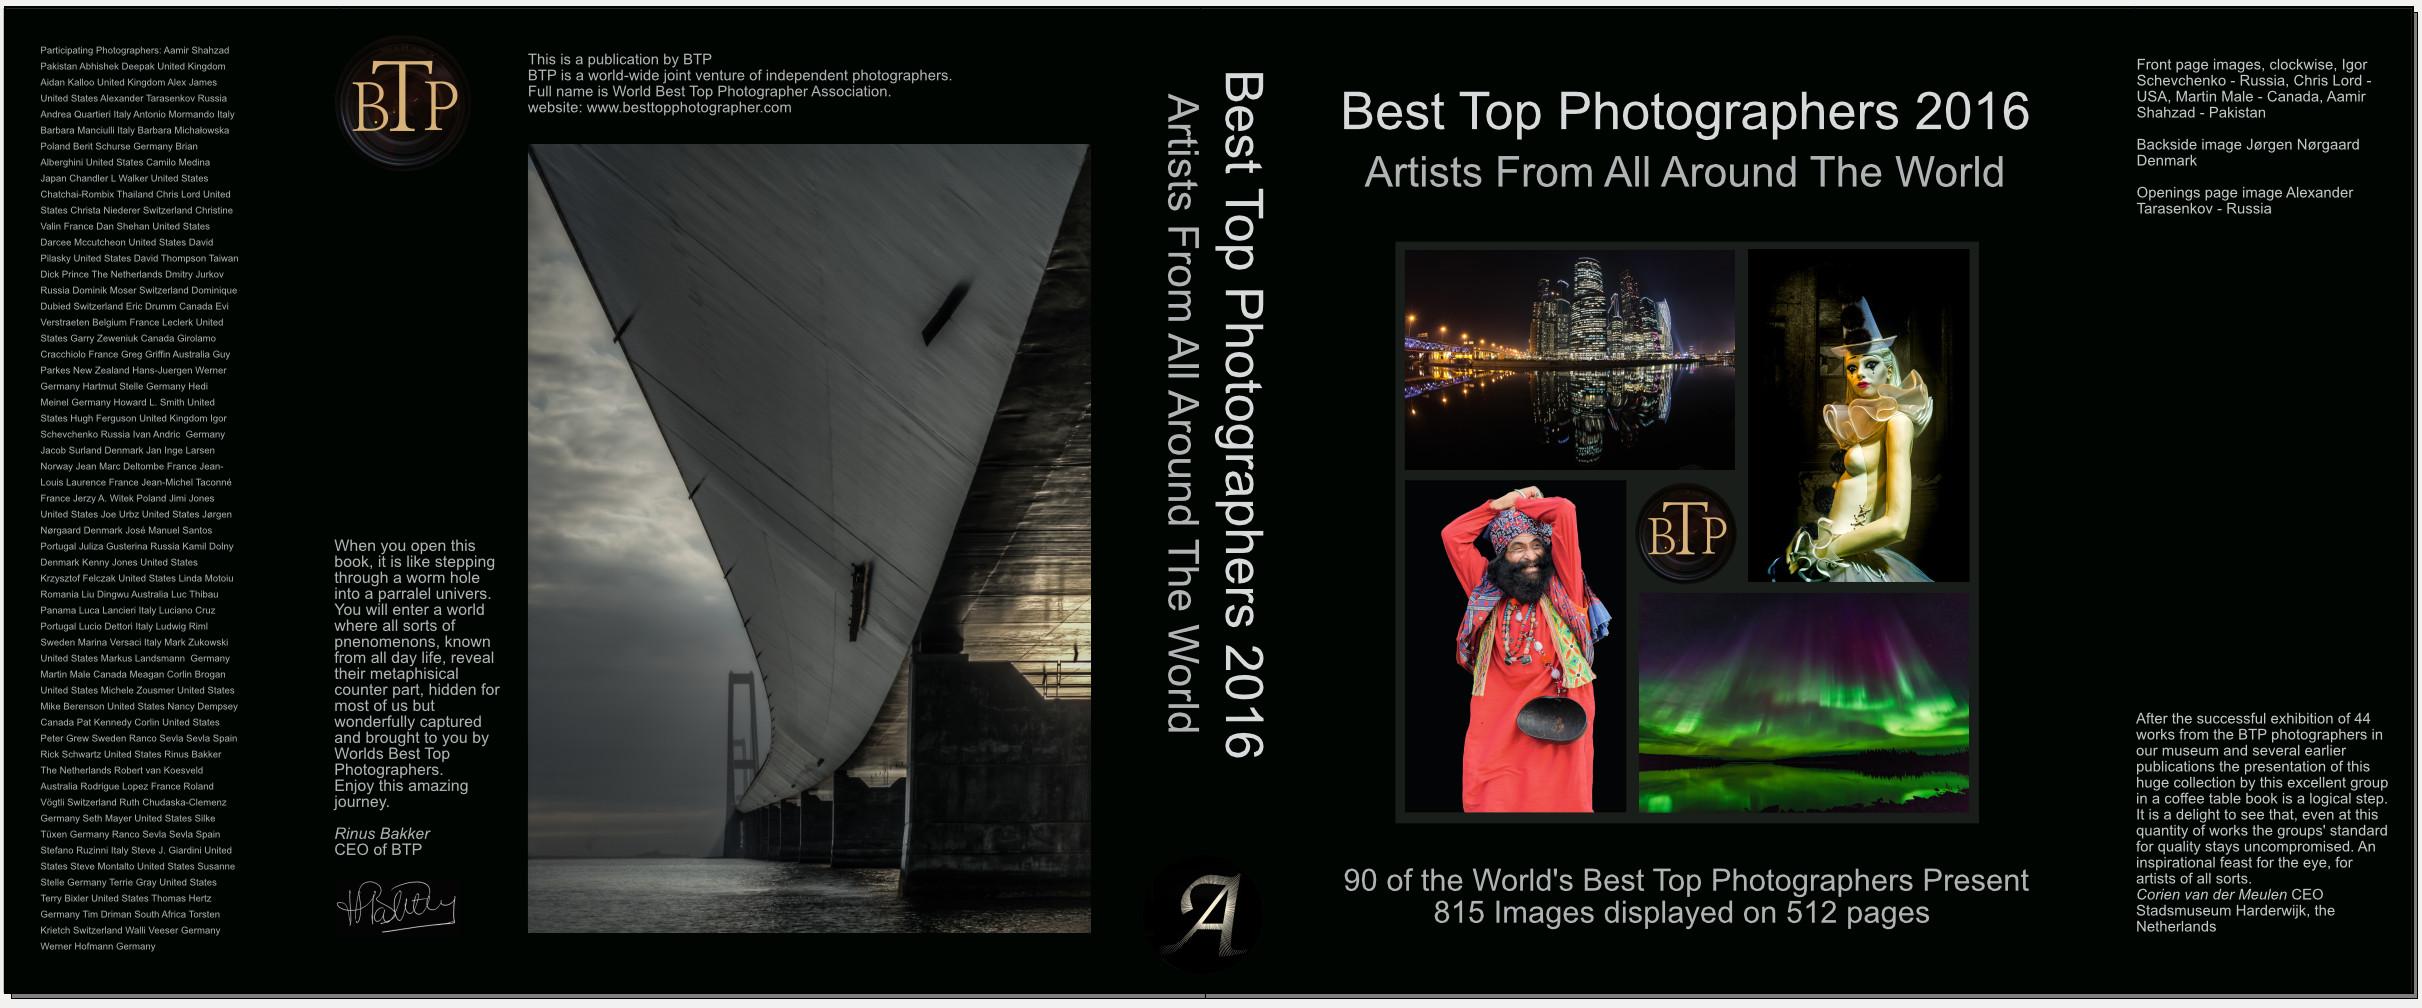 luxury printed btp photo book preview slideshow